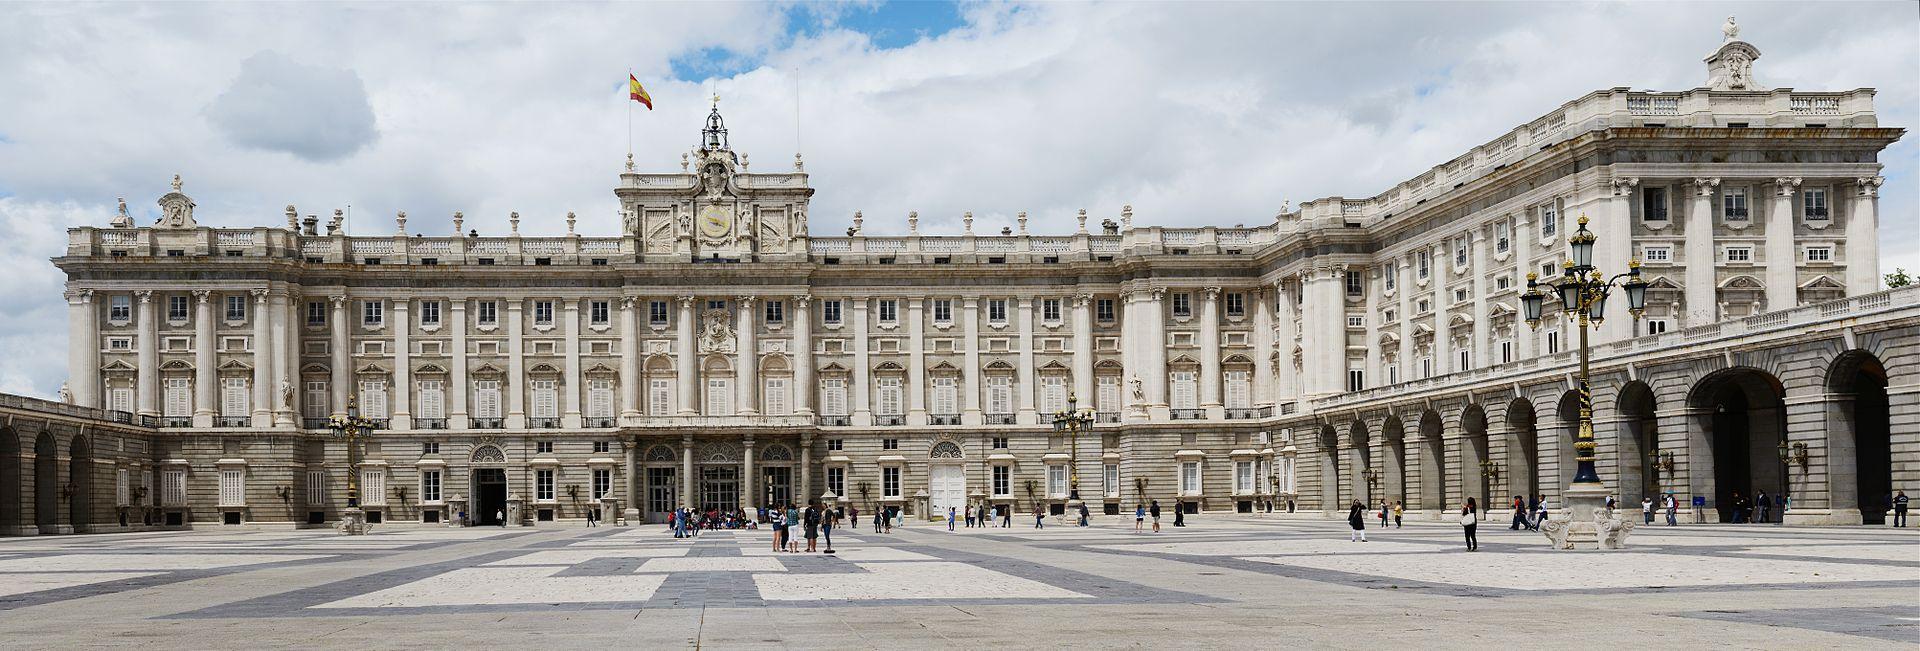 Royal Palace of Madrid - Sheet2